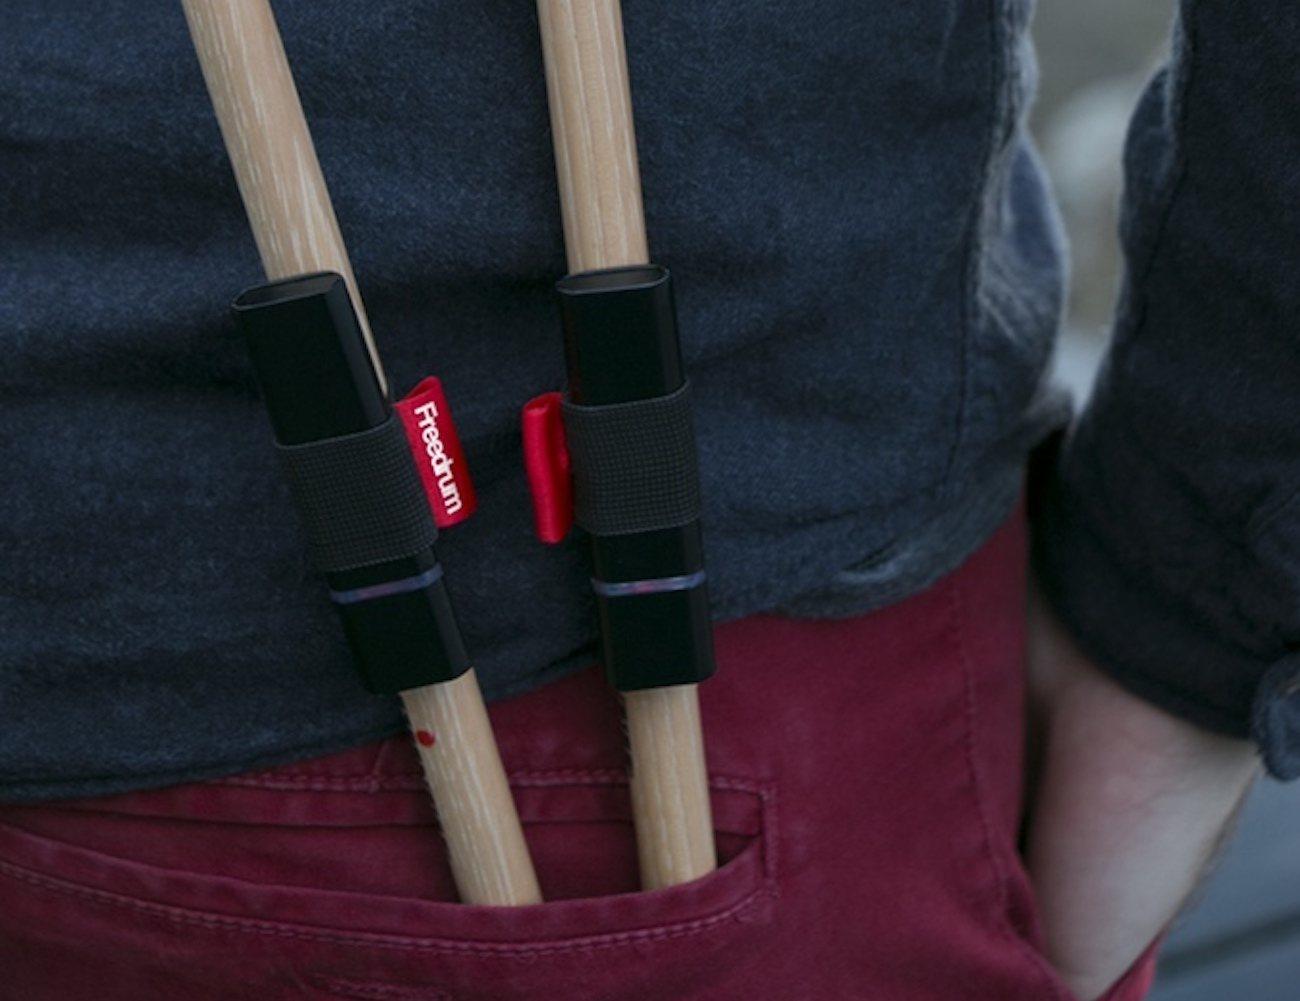 Freedrum Portable Drum Kit